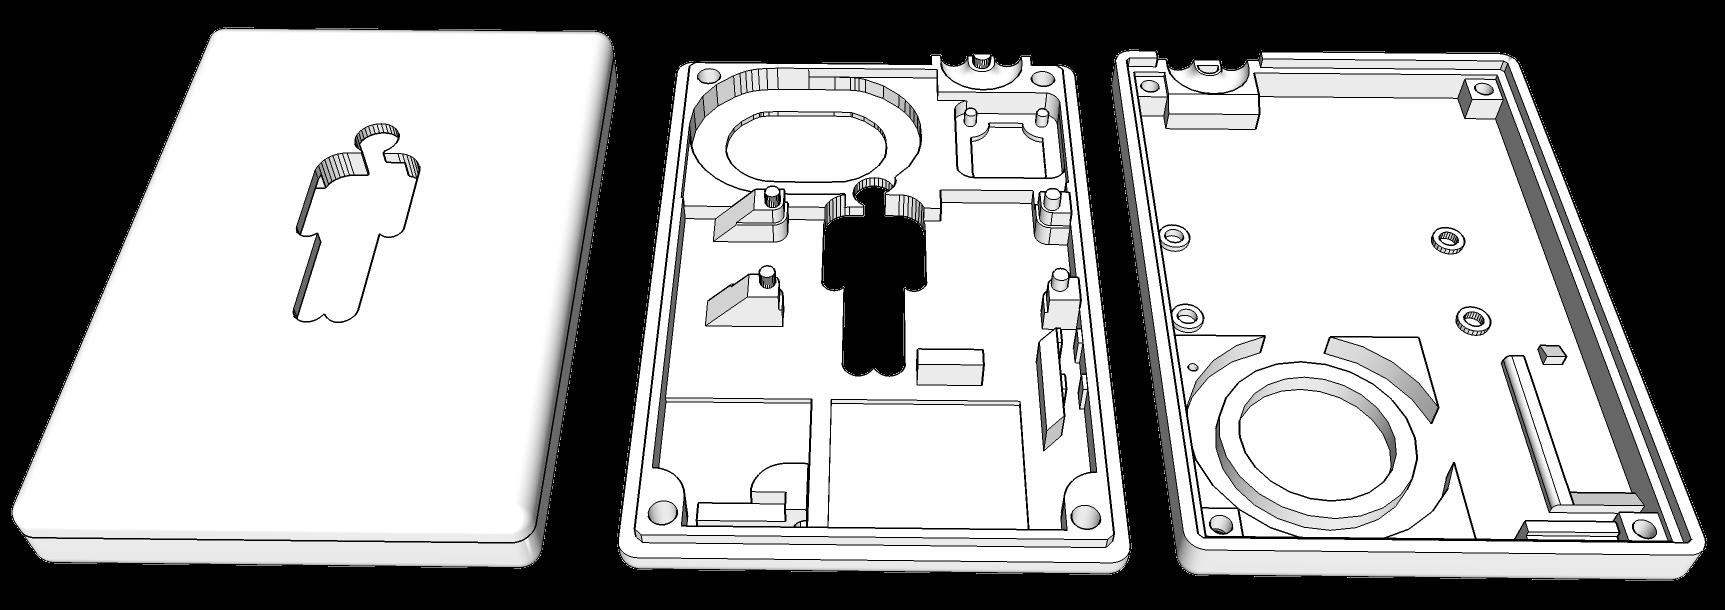 circuitpython_Restroom_Key_06.png